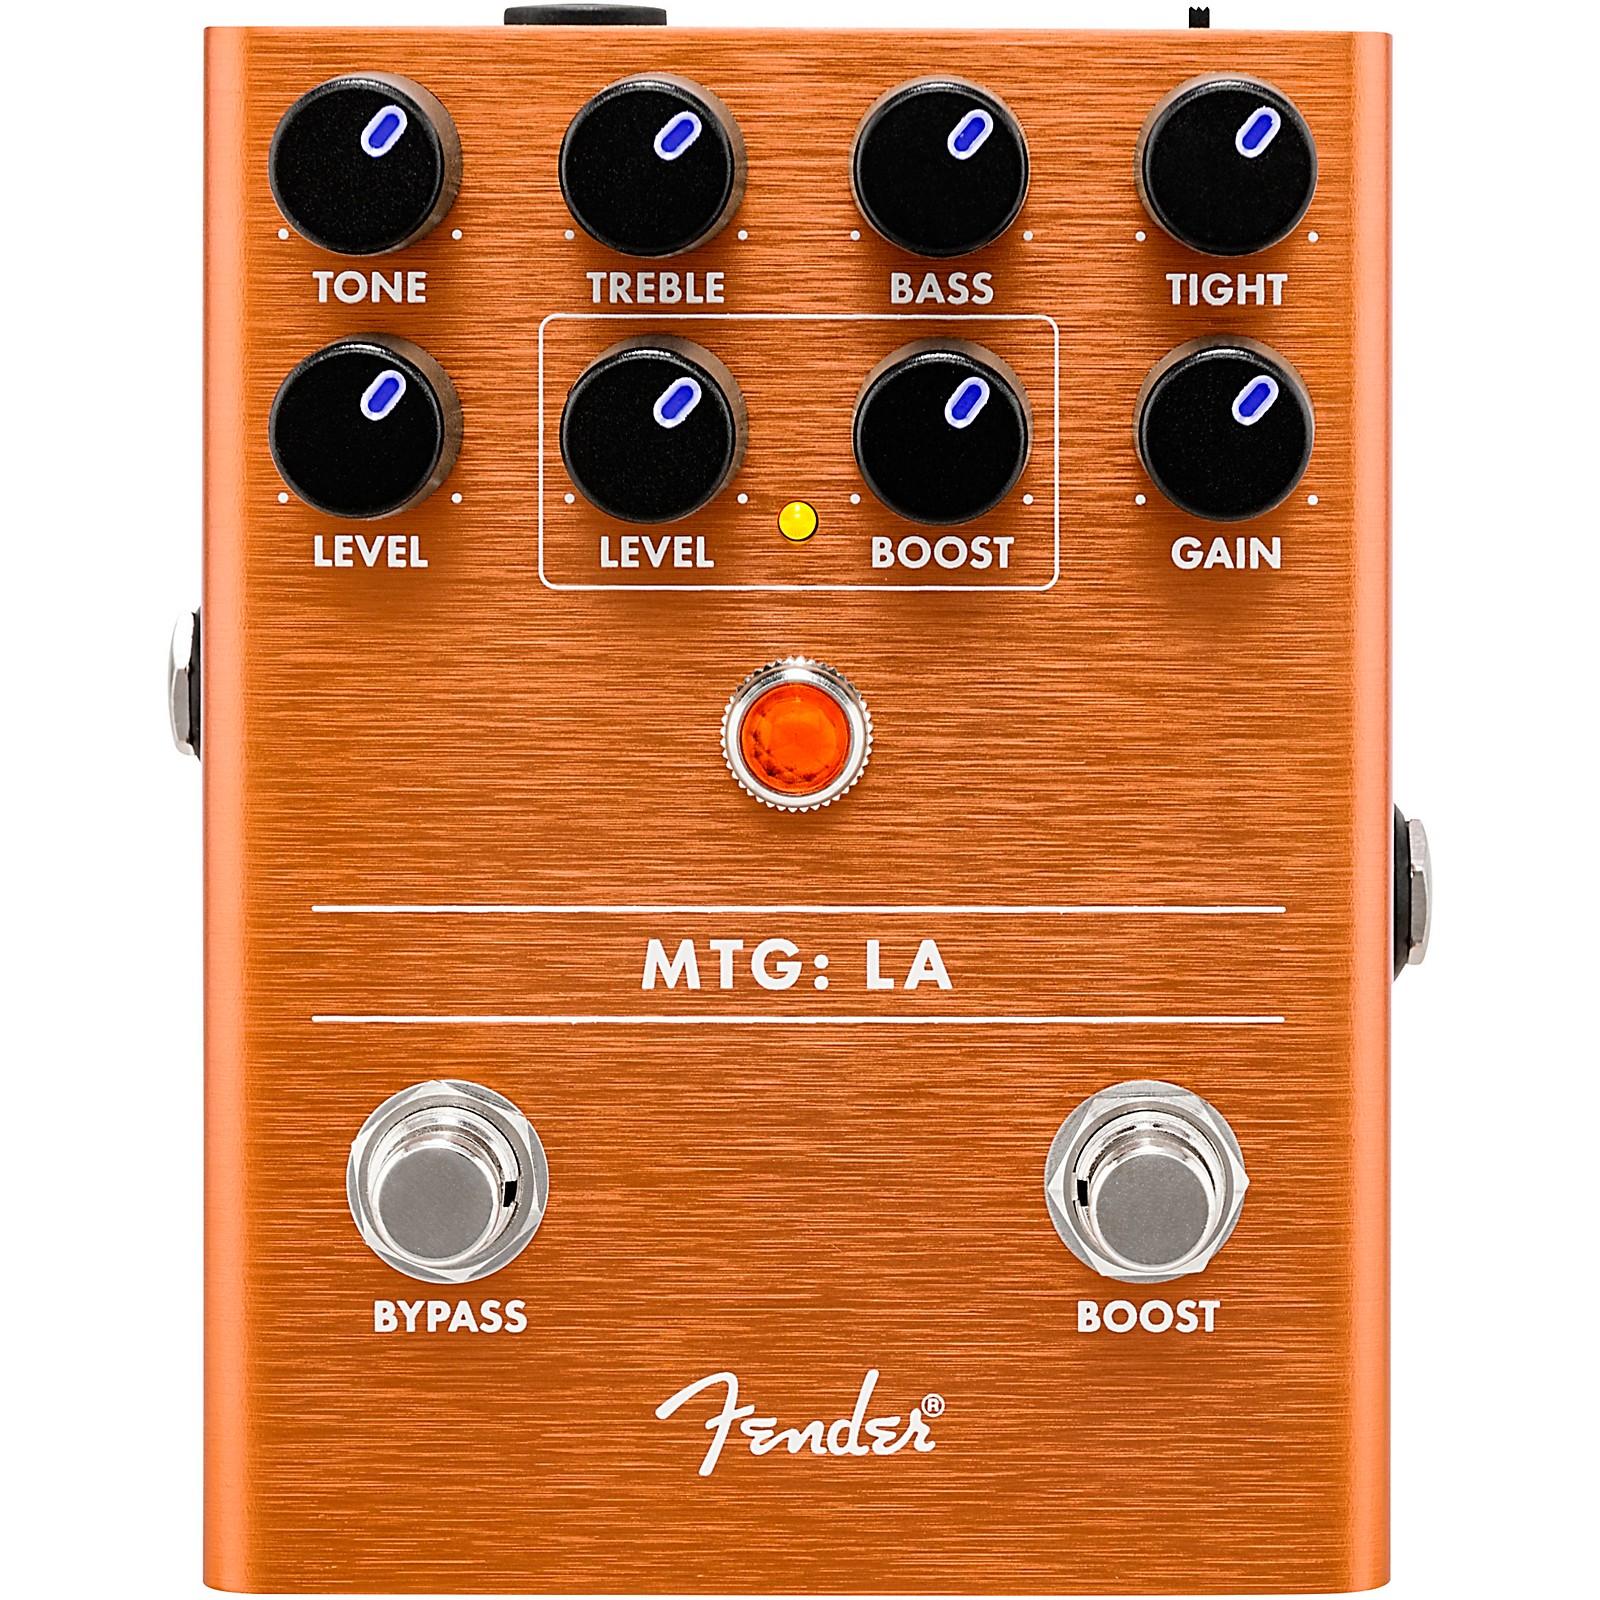 Fender MTG: LA Tube Distortion Effects Pedal